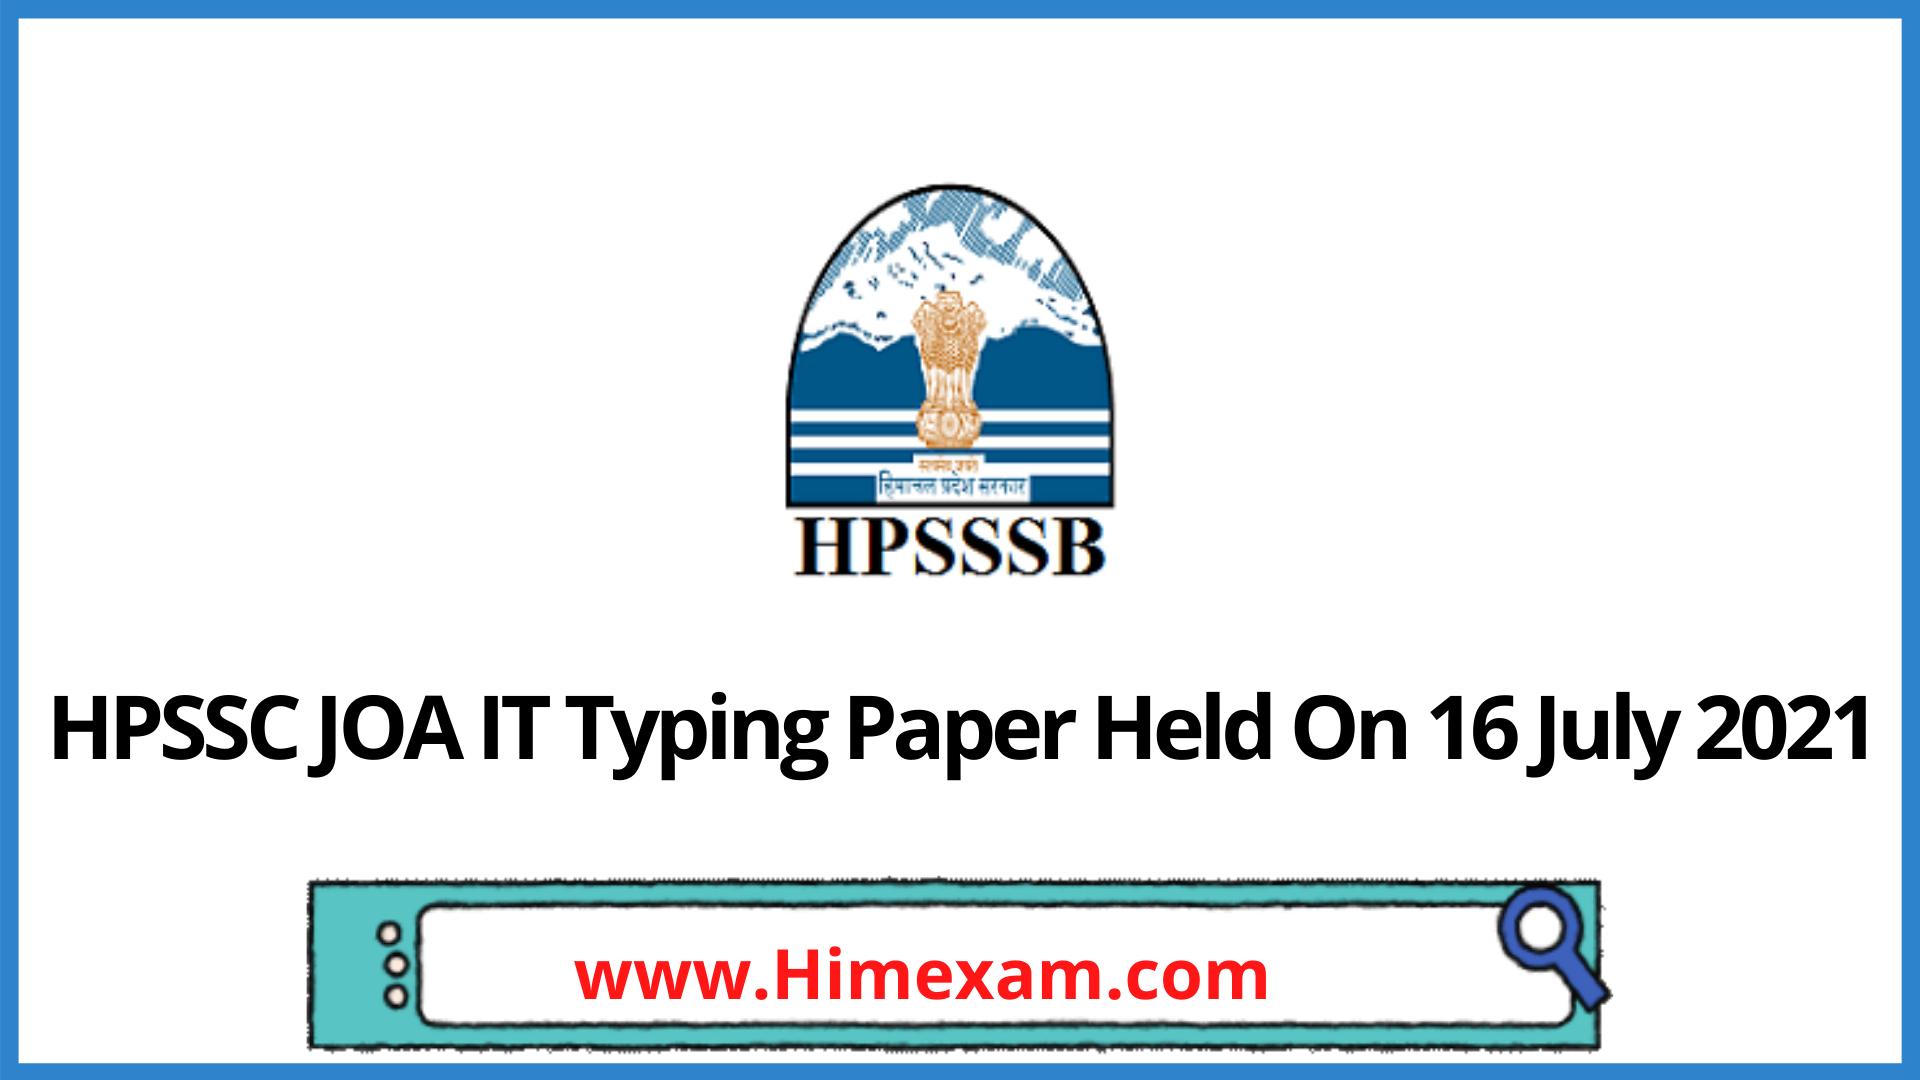 HPSSC JOA IT Typing Paper Held On 16 July 2021